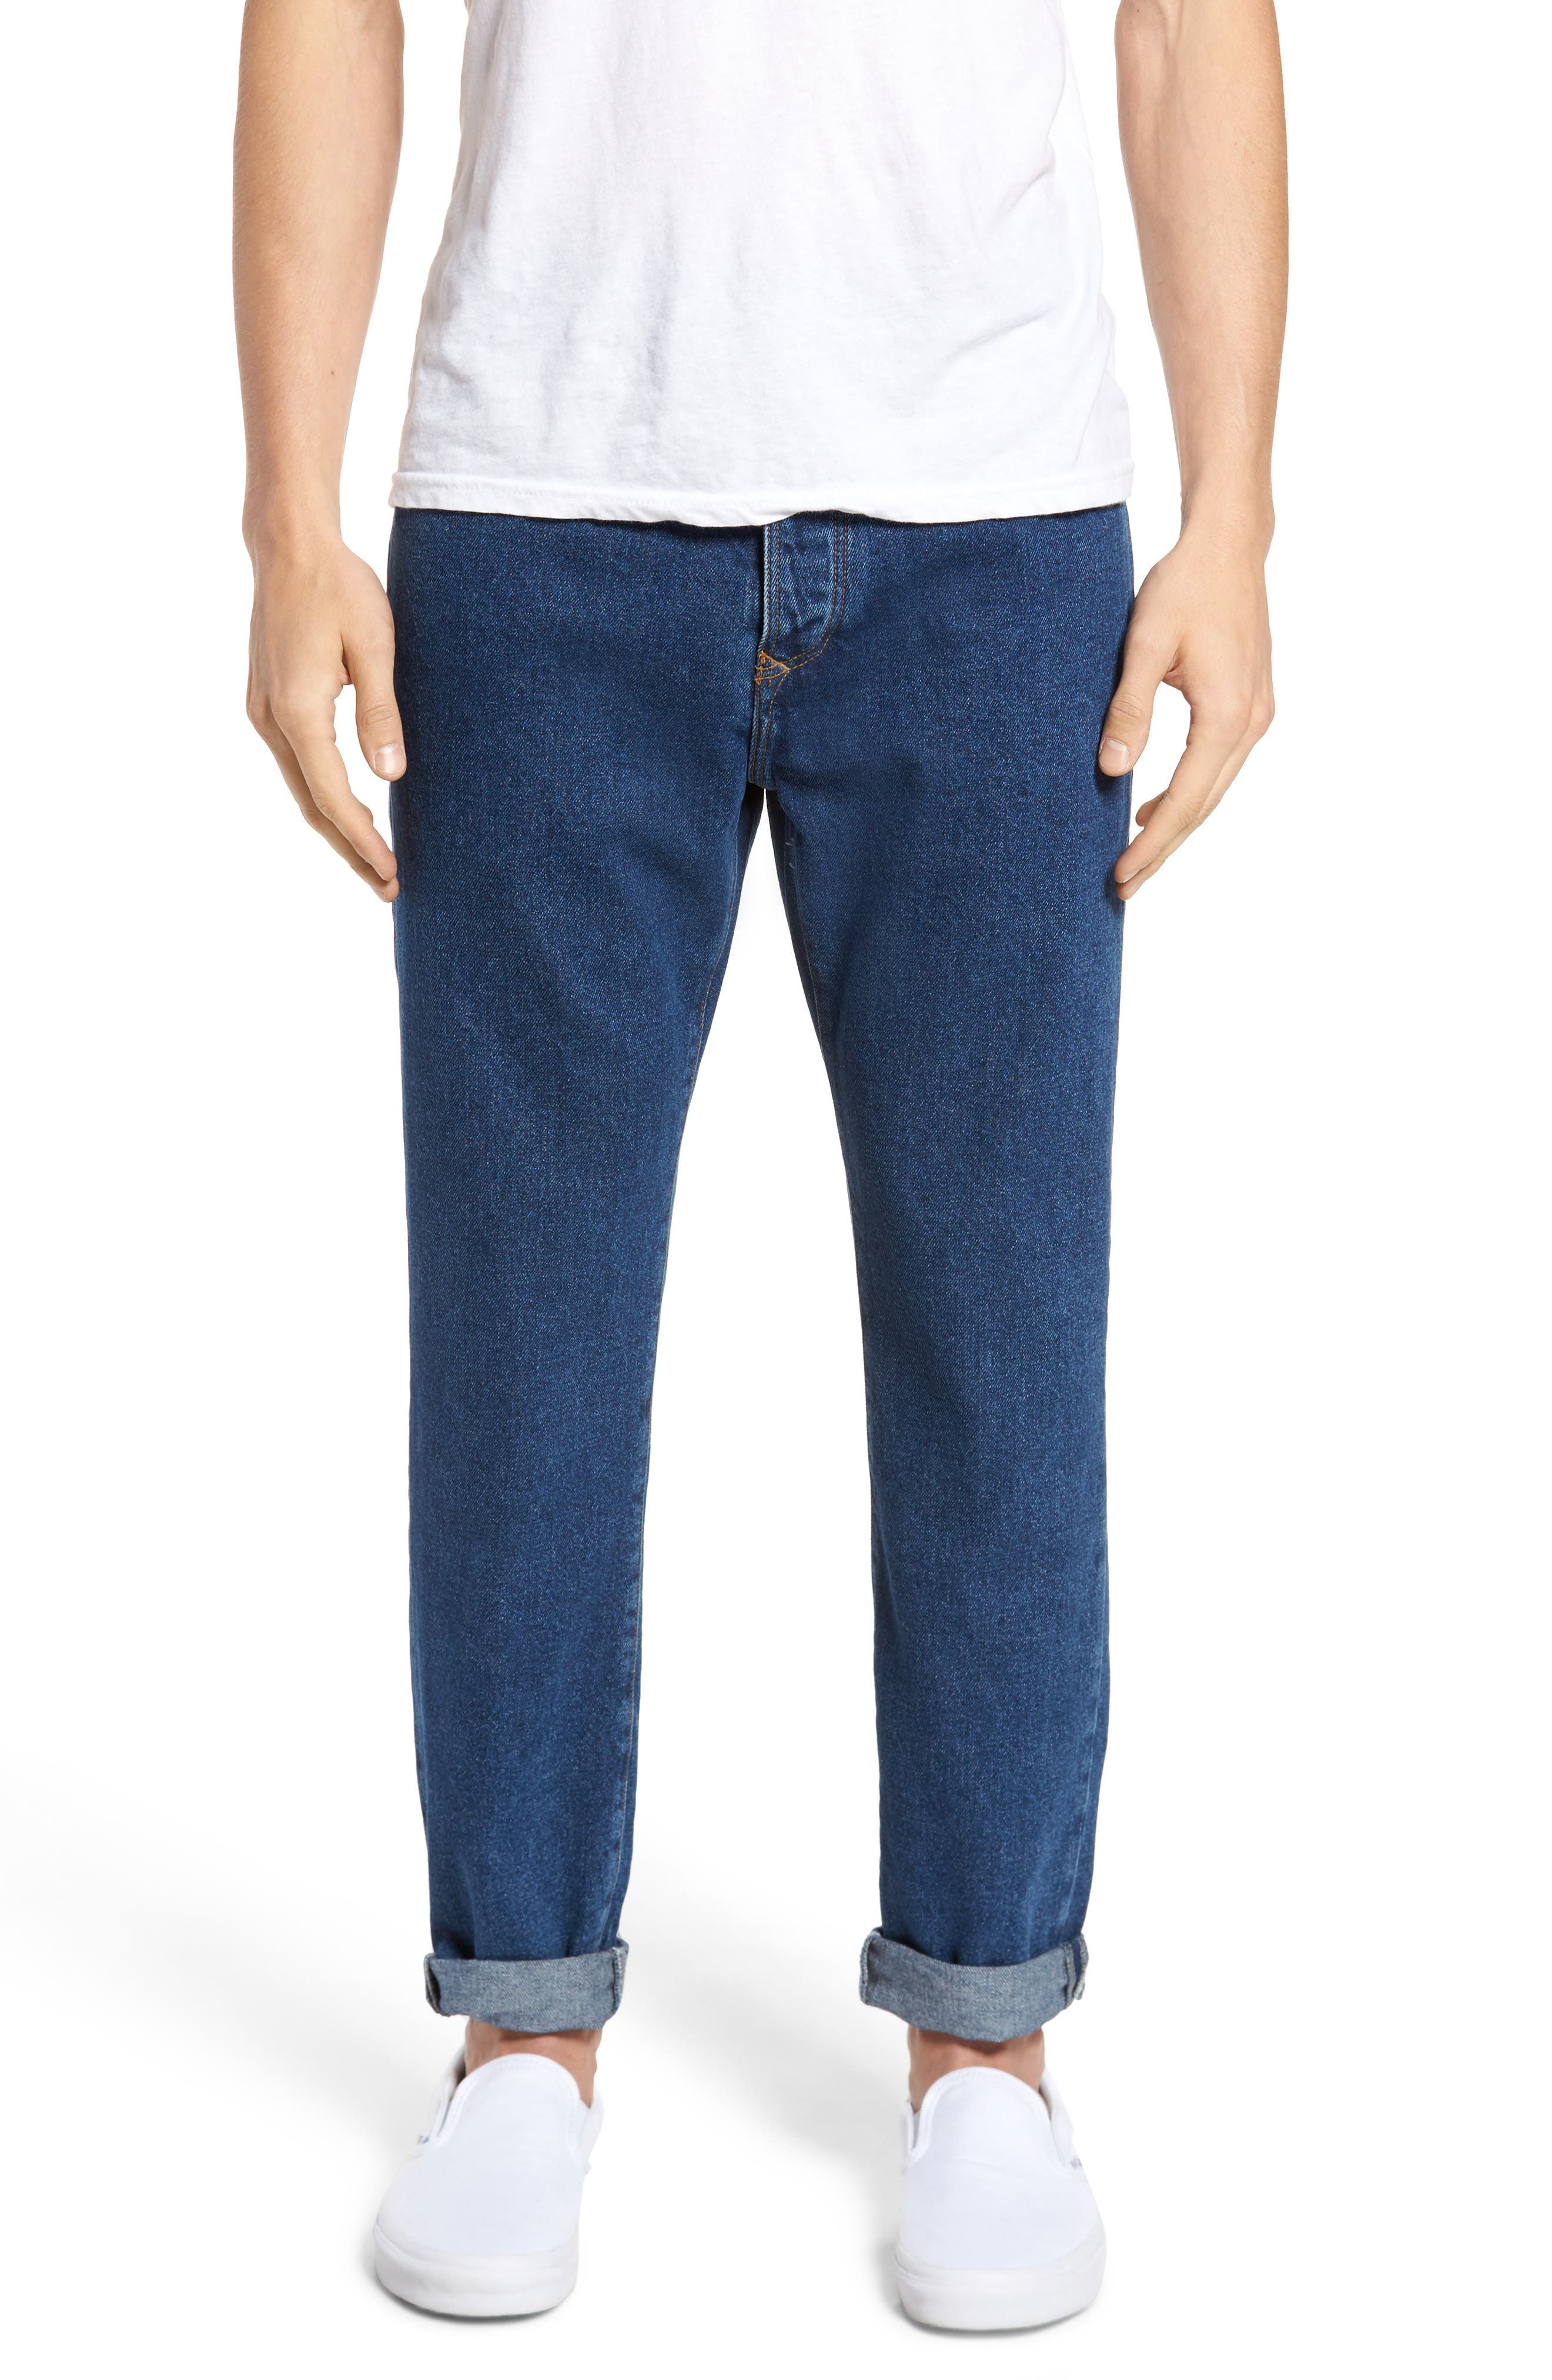 Alternate Image 1 Selected - Tommy Hilfiger 90s Classic Straight Leg Jeans (Denim Blue)